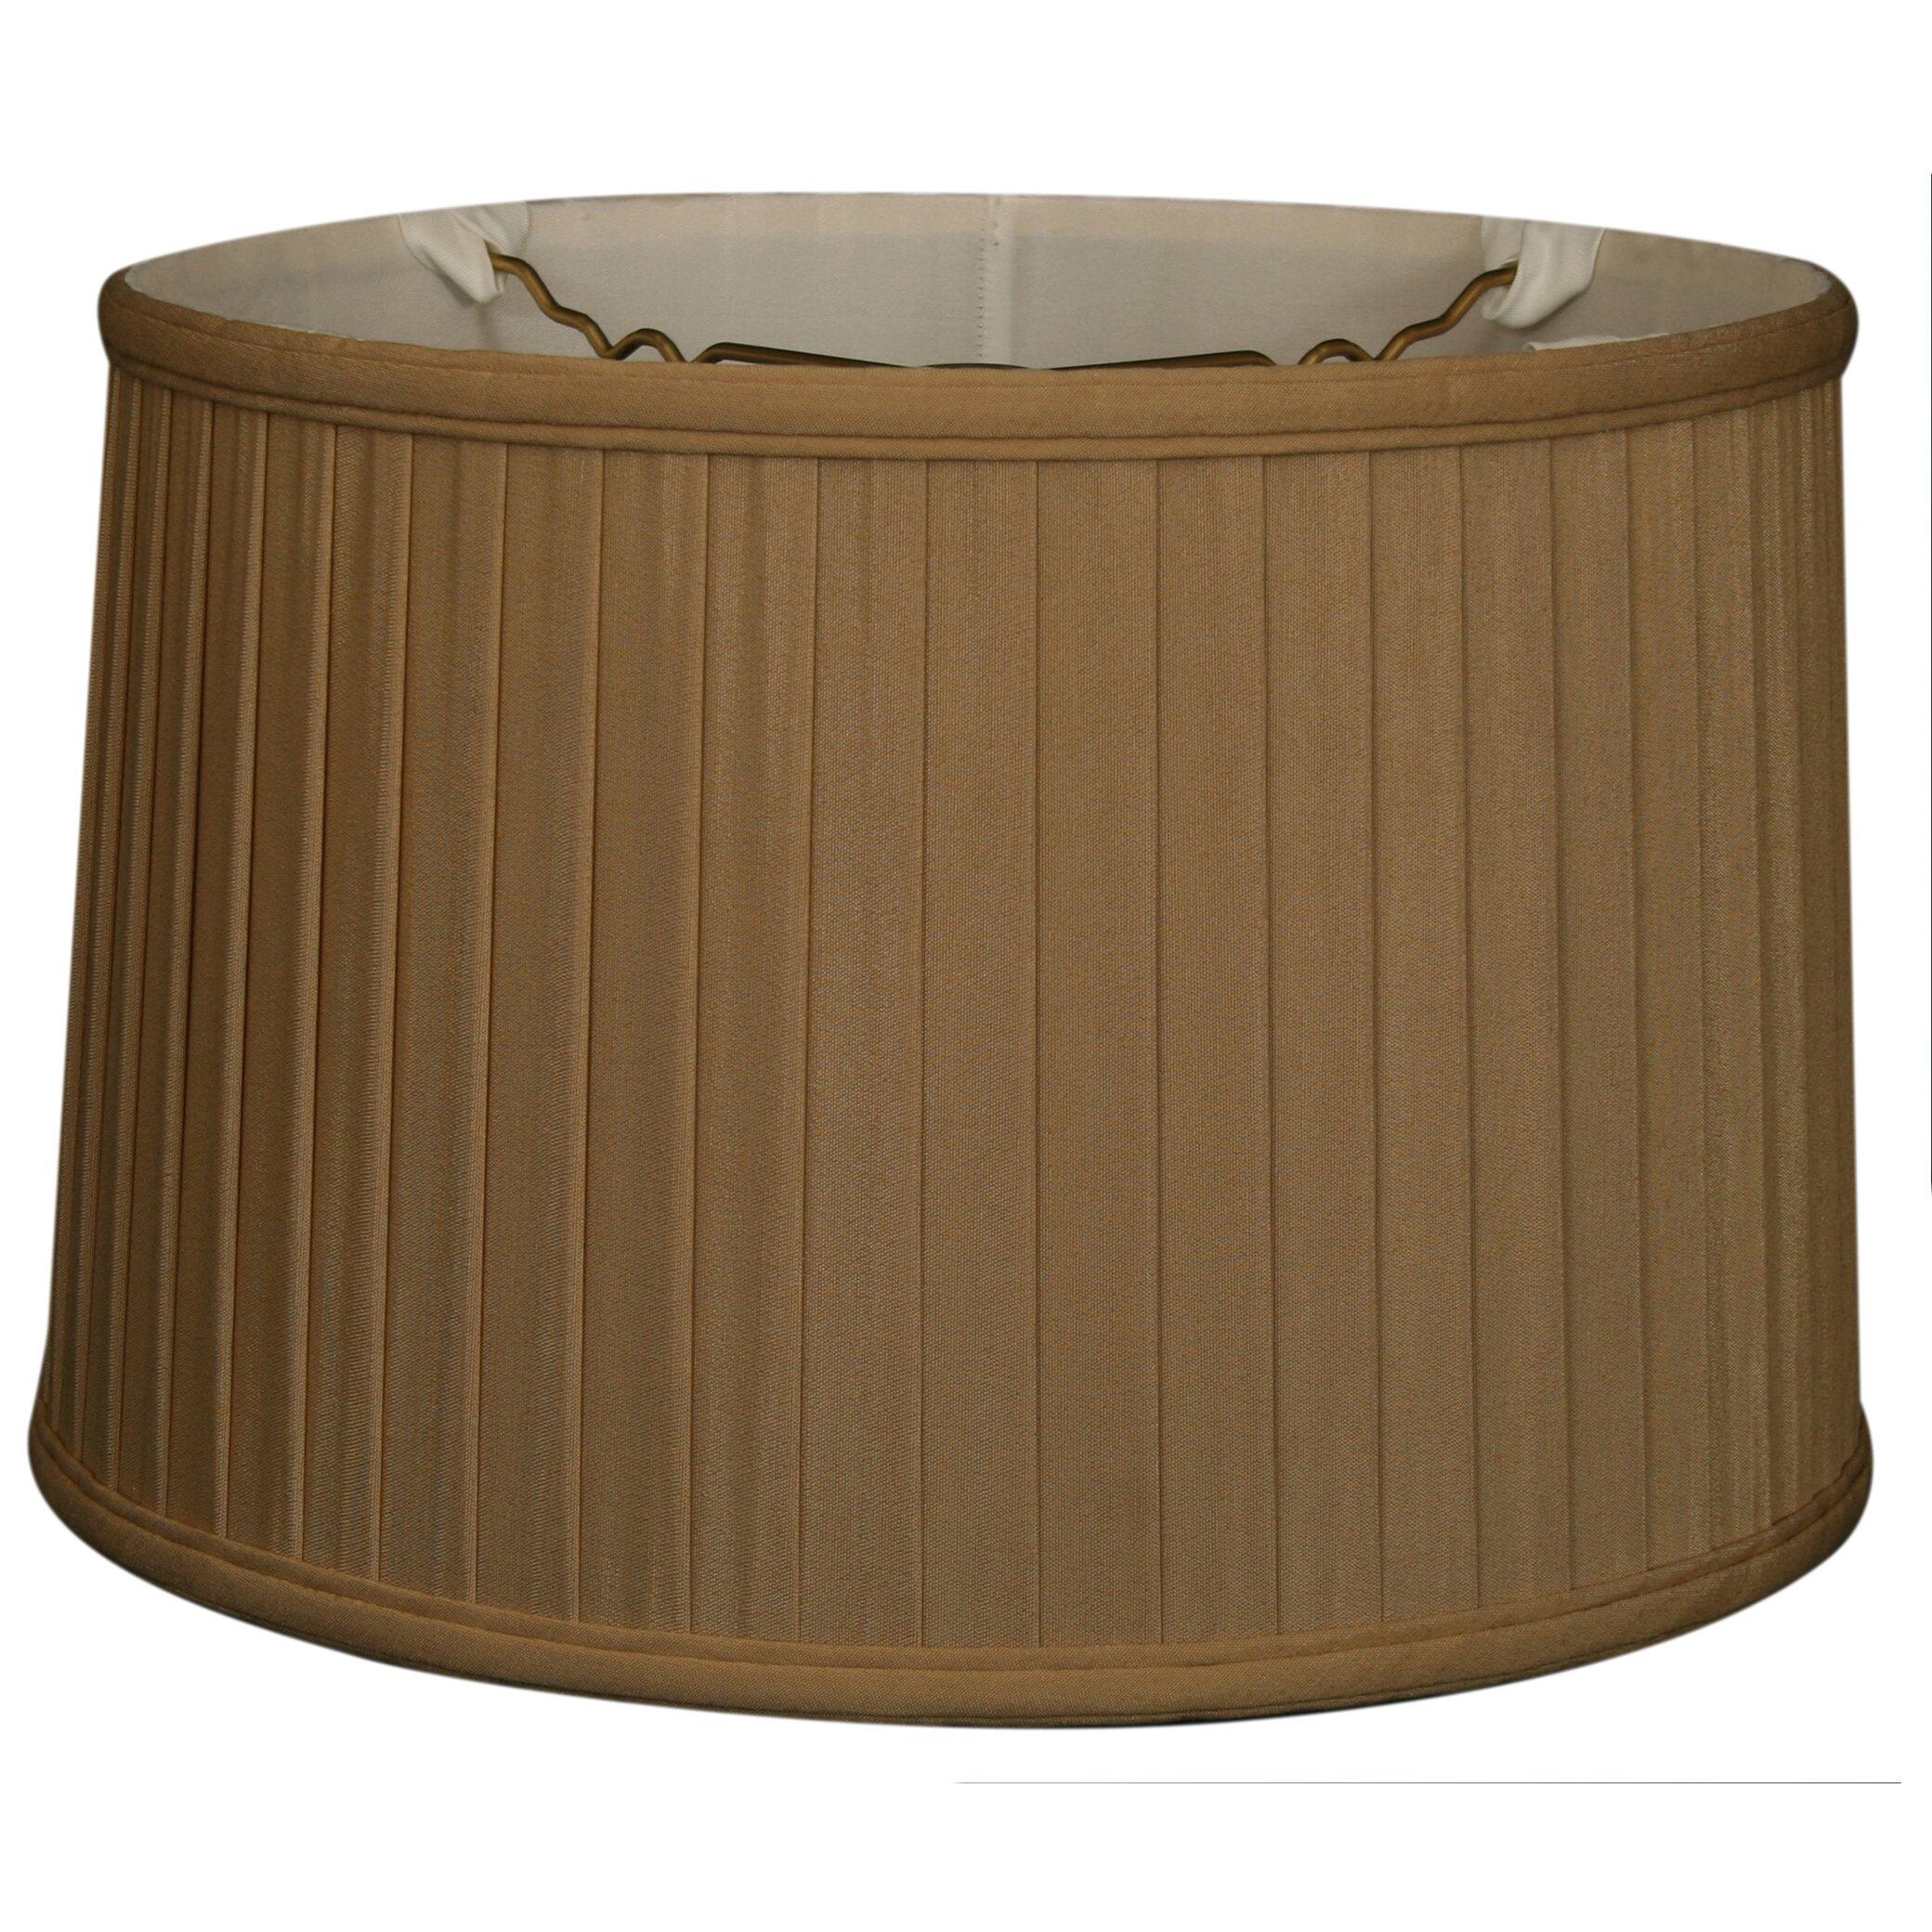 royaldesigns 18 timeless silk drum lamp shade wayfair. Black Bedroom Furniture Sets. Home Design Ideas